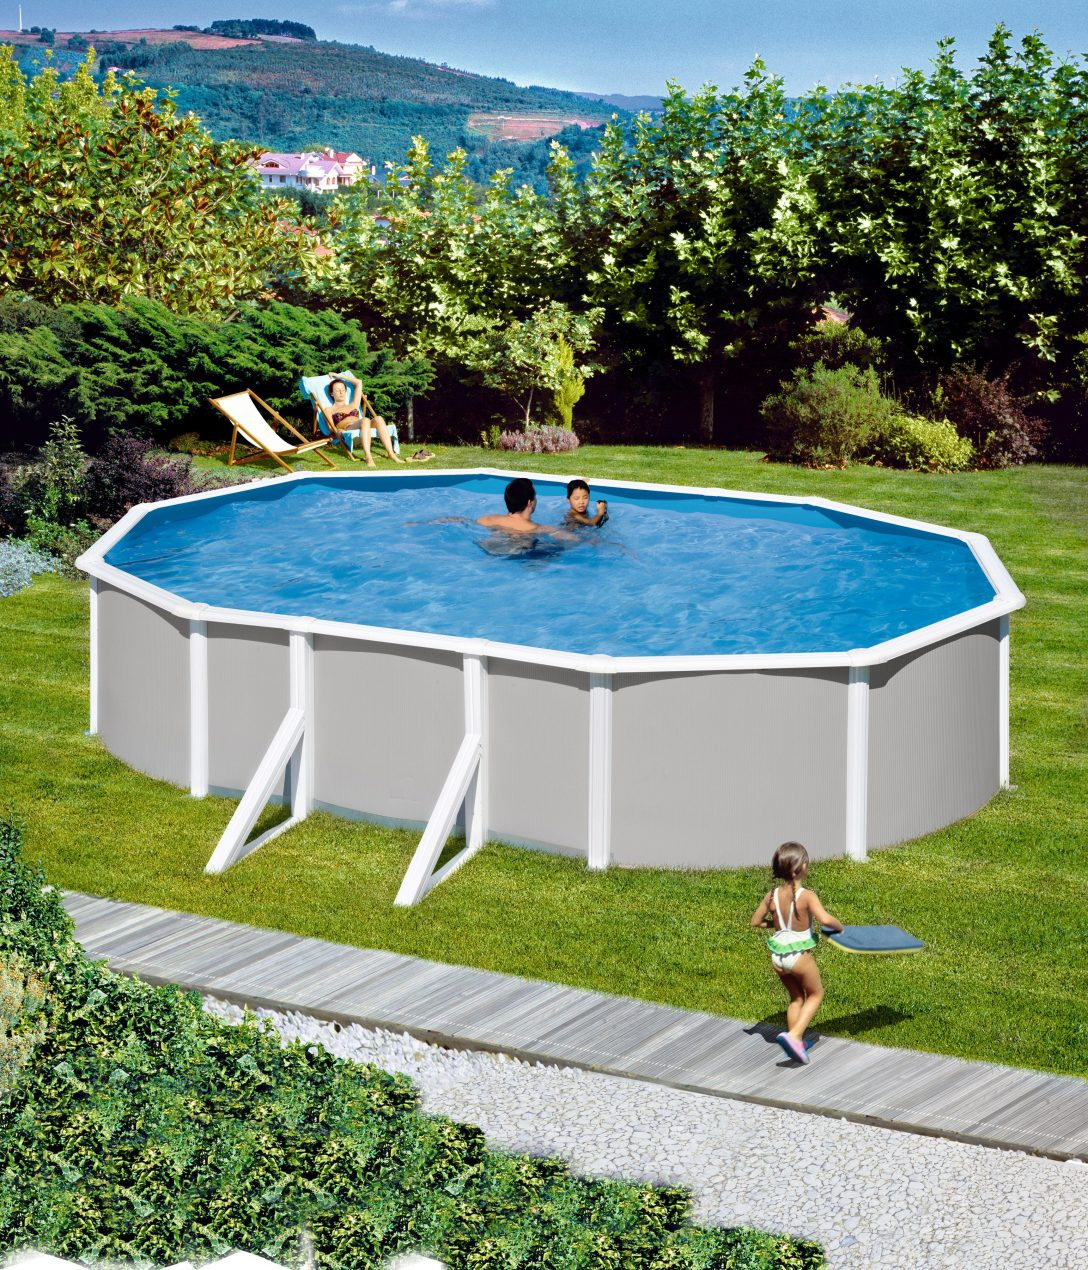 Large Size of Obi Pool Bestway Fast Medence Szett 366 Cm 76 Vsrlsa Az Garten Whirlpool Swimmingpool Immobilien Bad Homburg Einbauküche Nobilia Küche Mini Aufblasbar Im Wohnzimmer Obi Pool